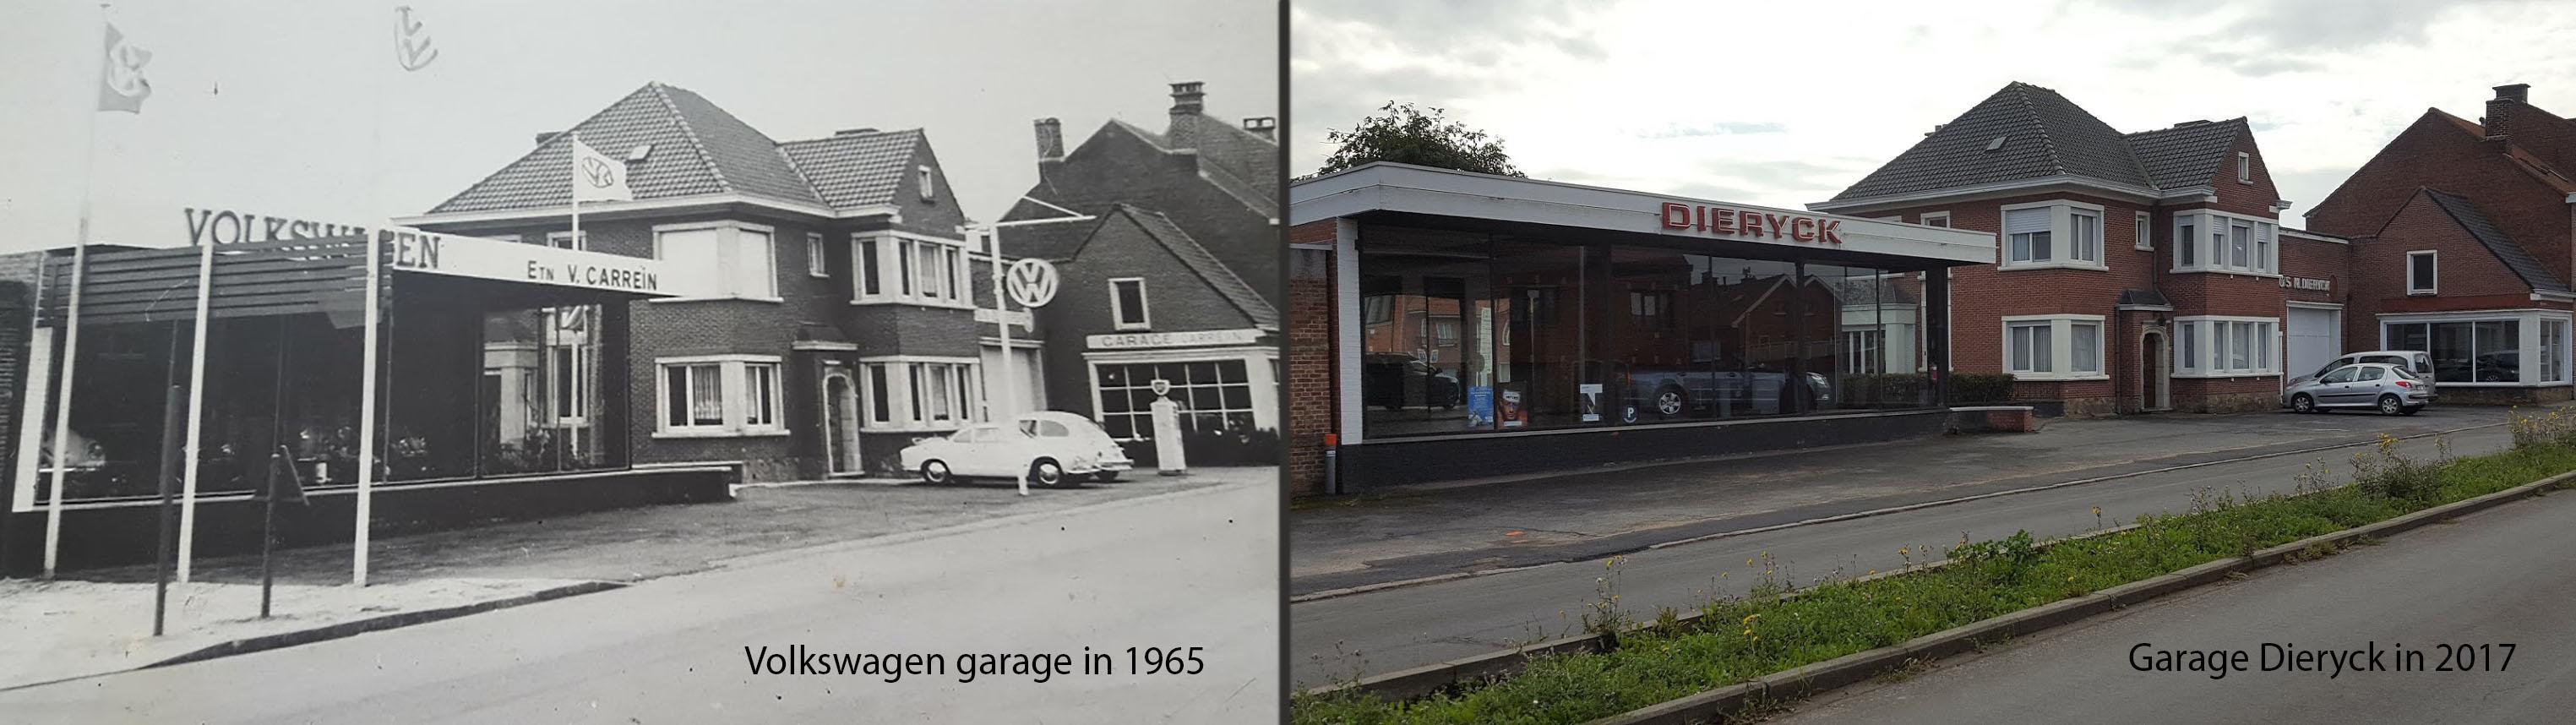 Geschiedenis Garage Dieryck Ieper